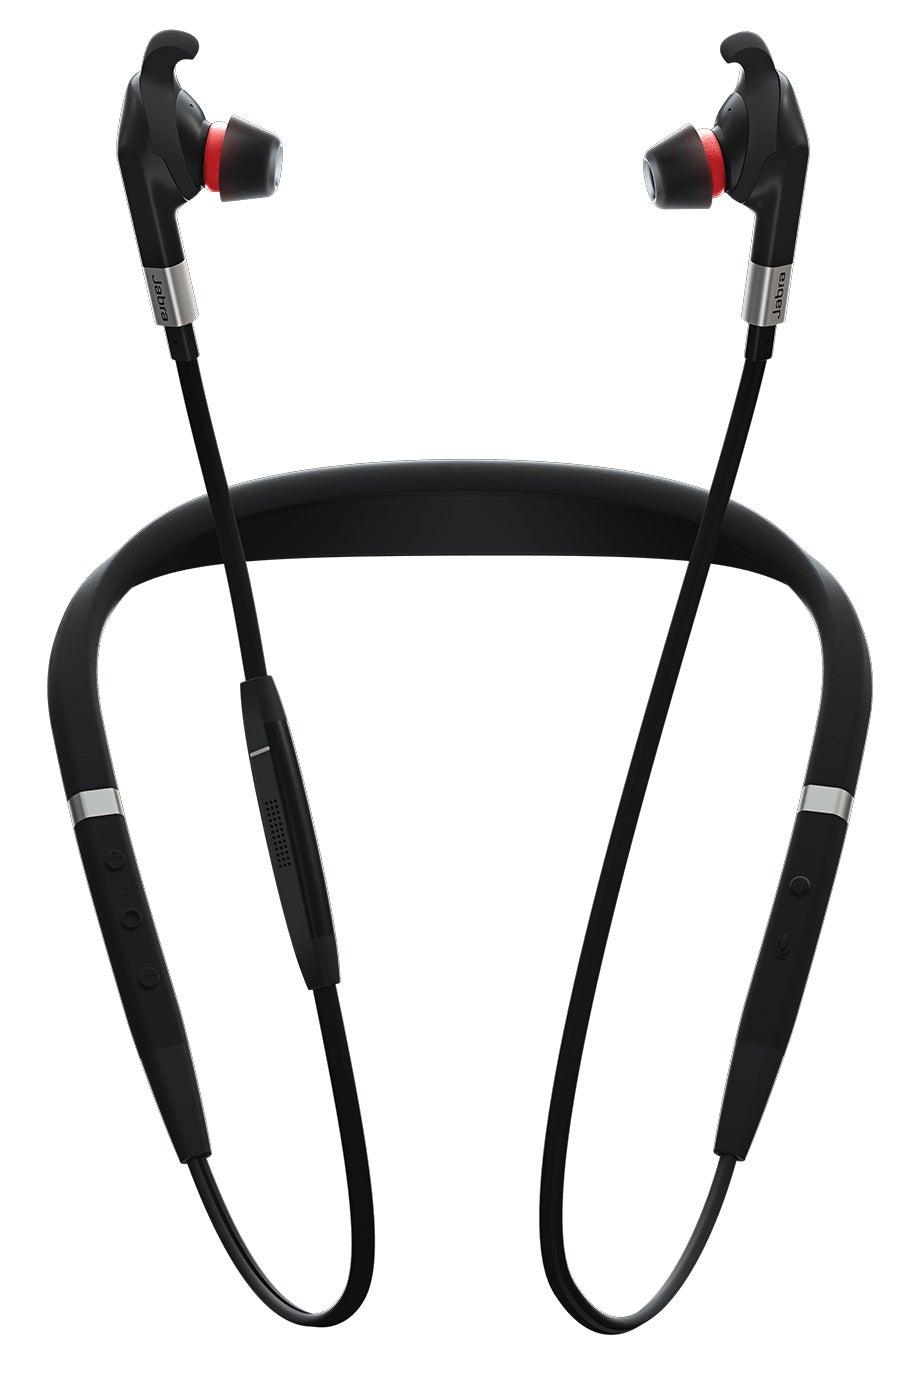 Jabra Evolve 75e Headset Neck-band Bluetooth Black